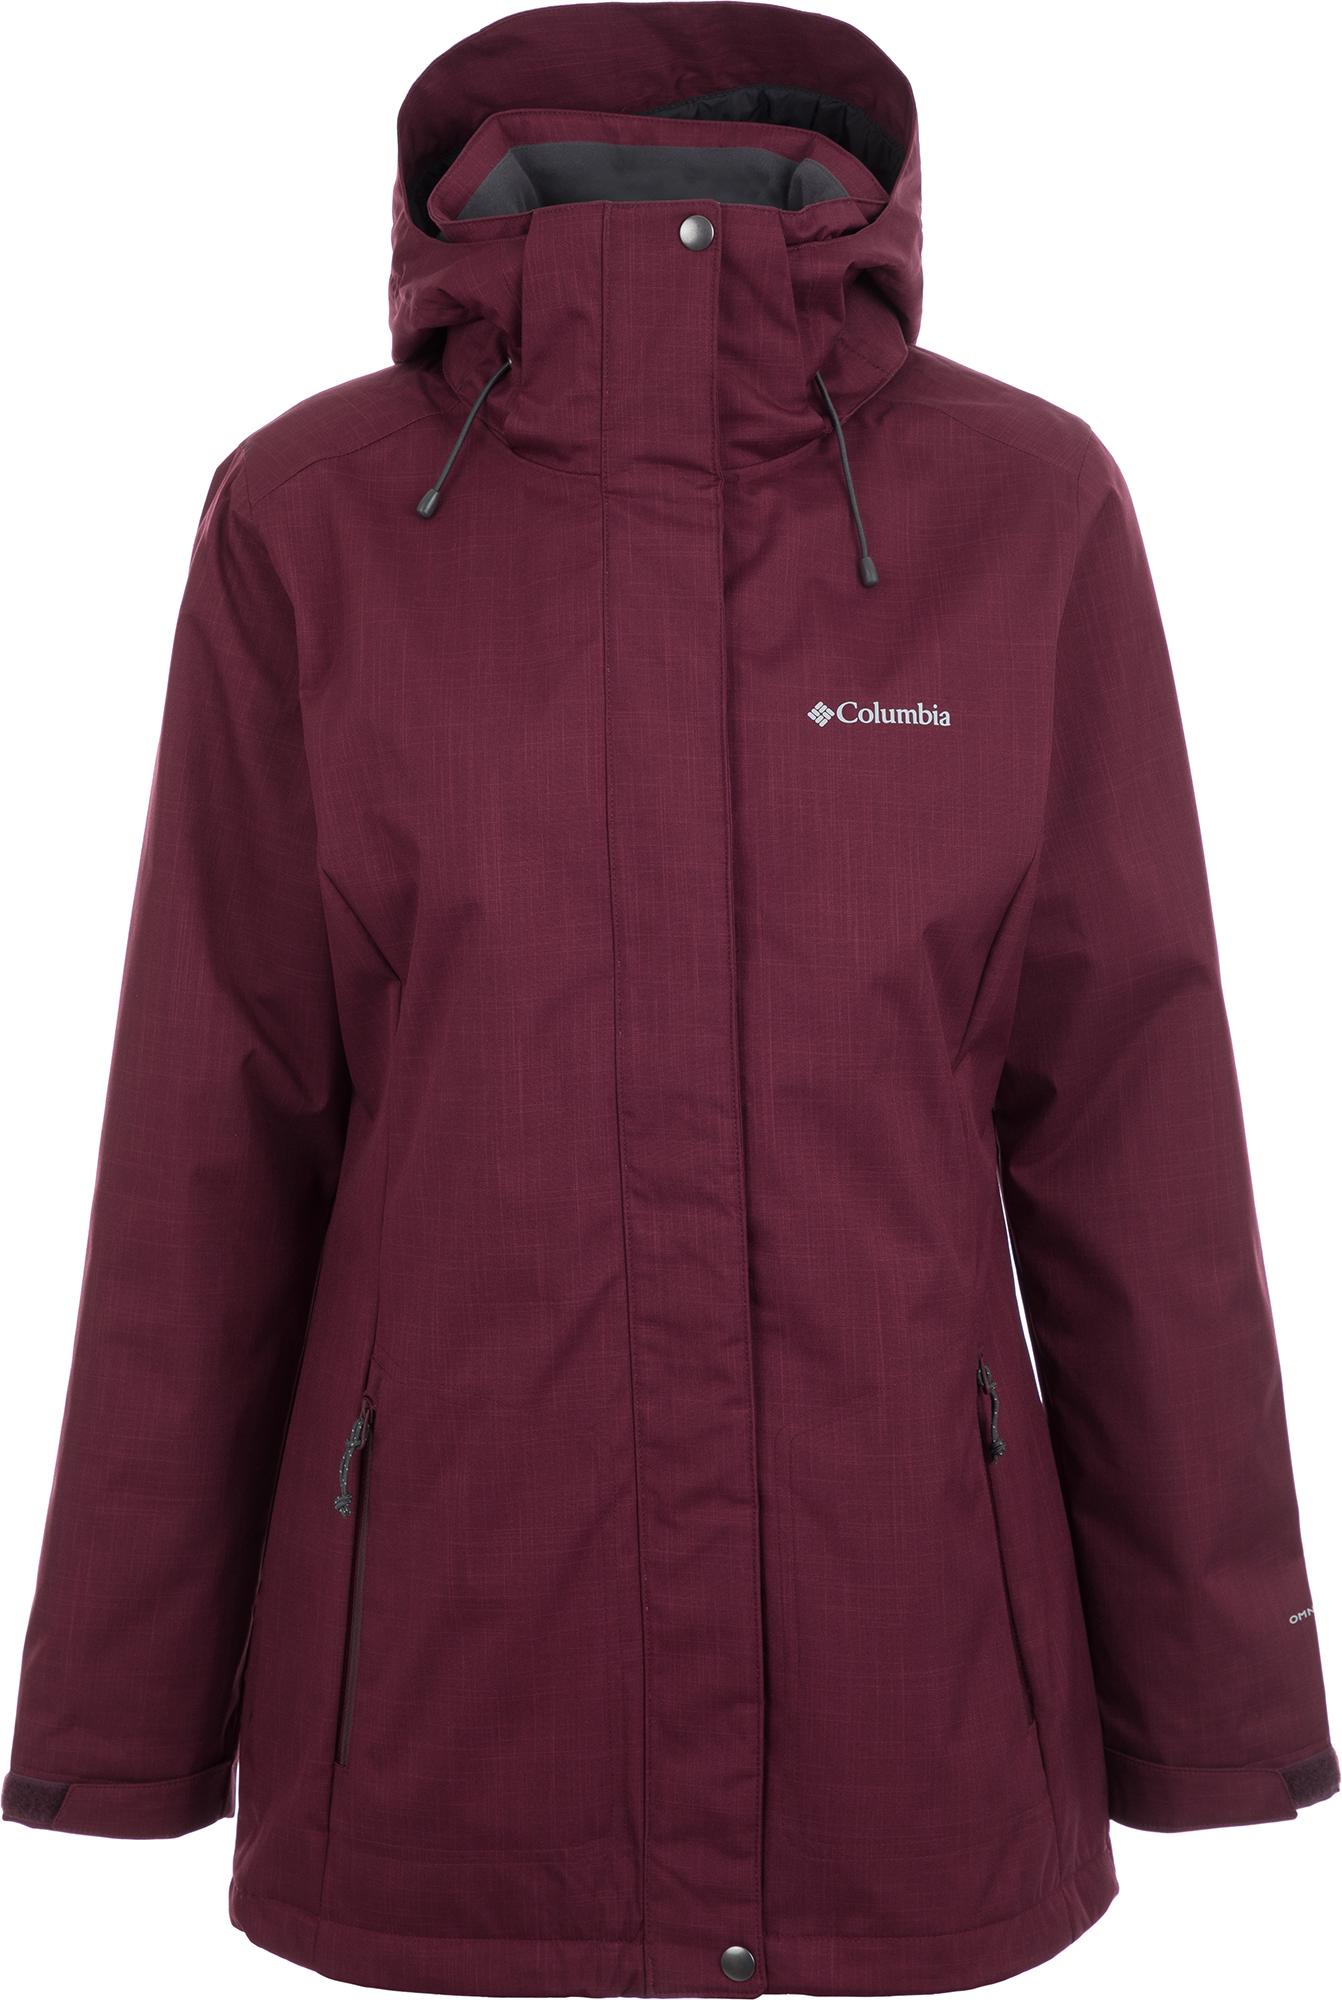 Columbia Куртка утепленная женская  Icy Cape Insulated, размер 48